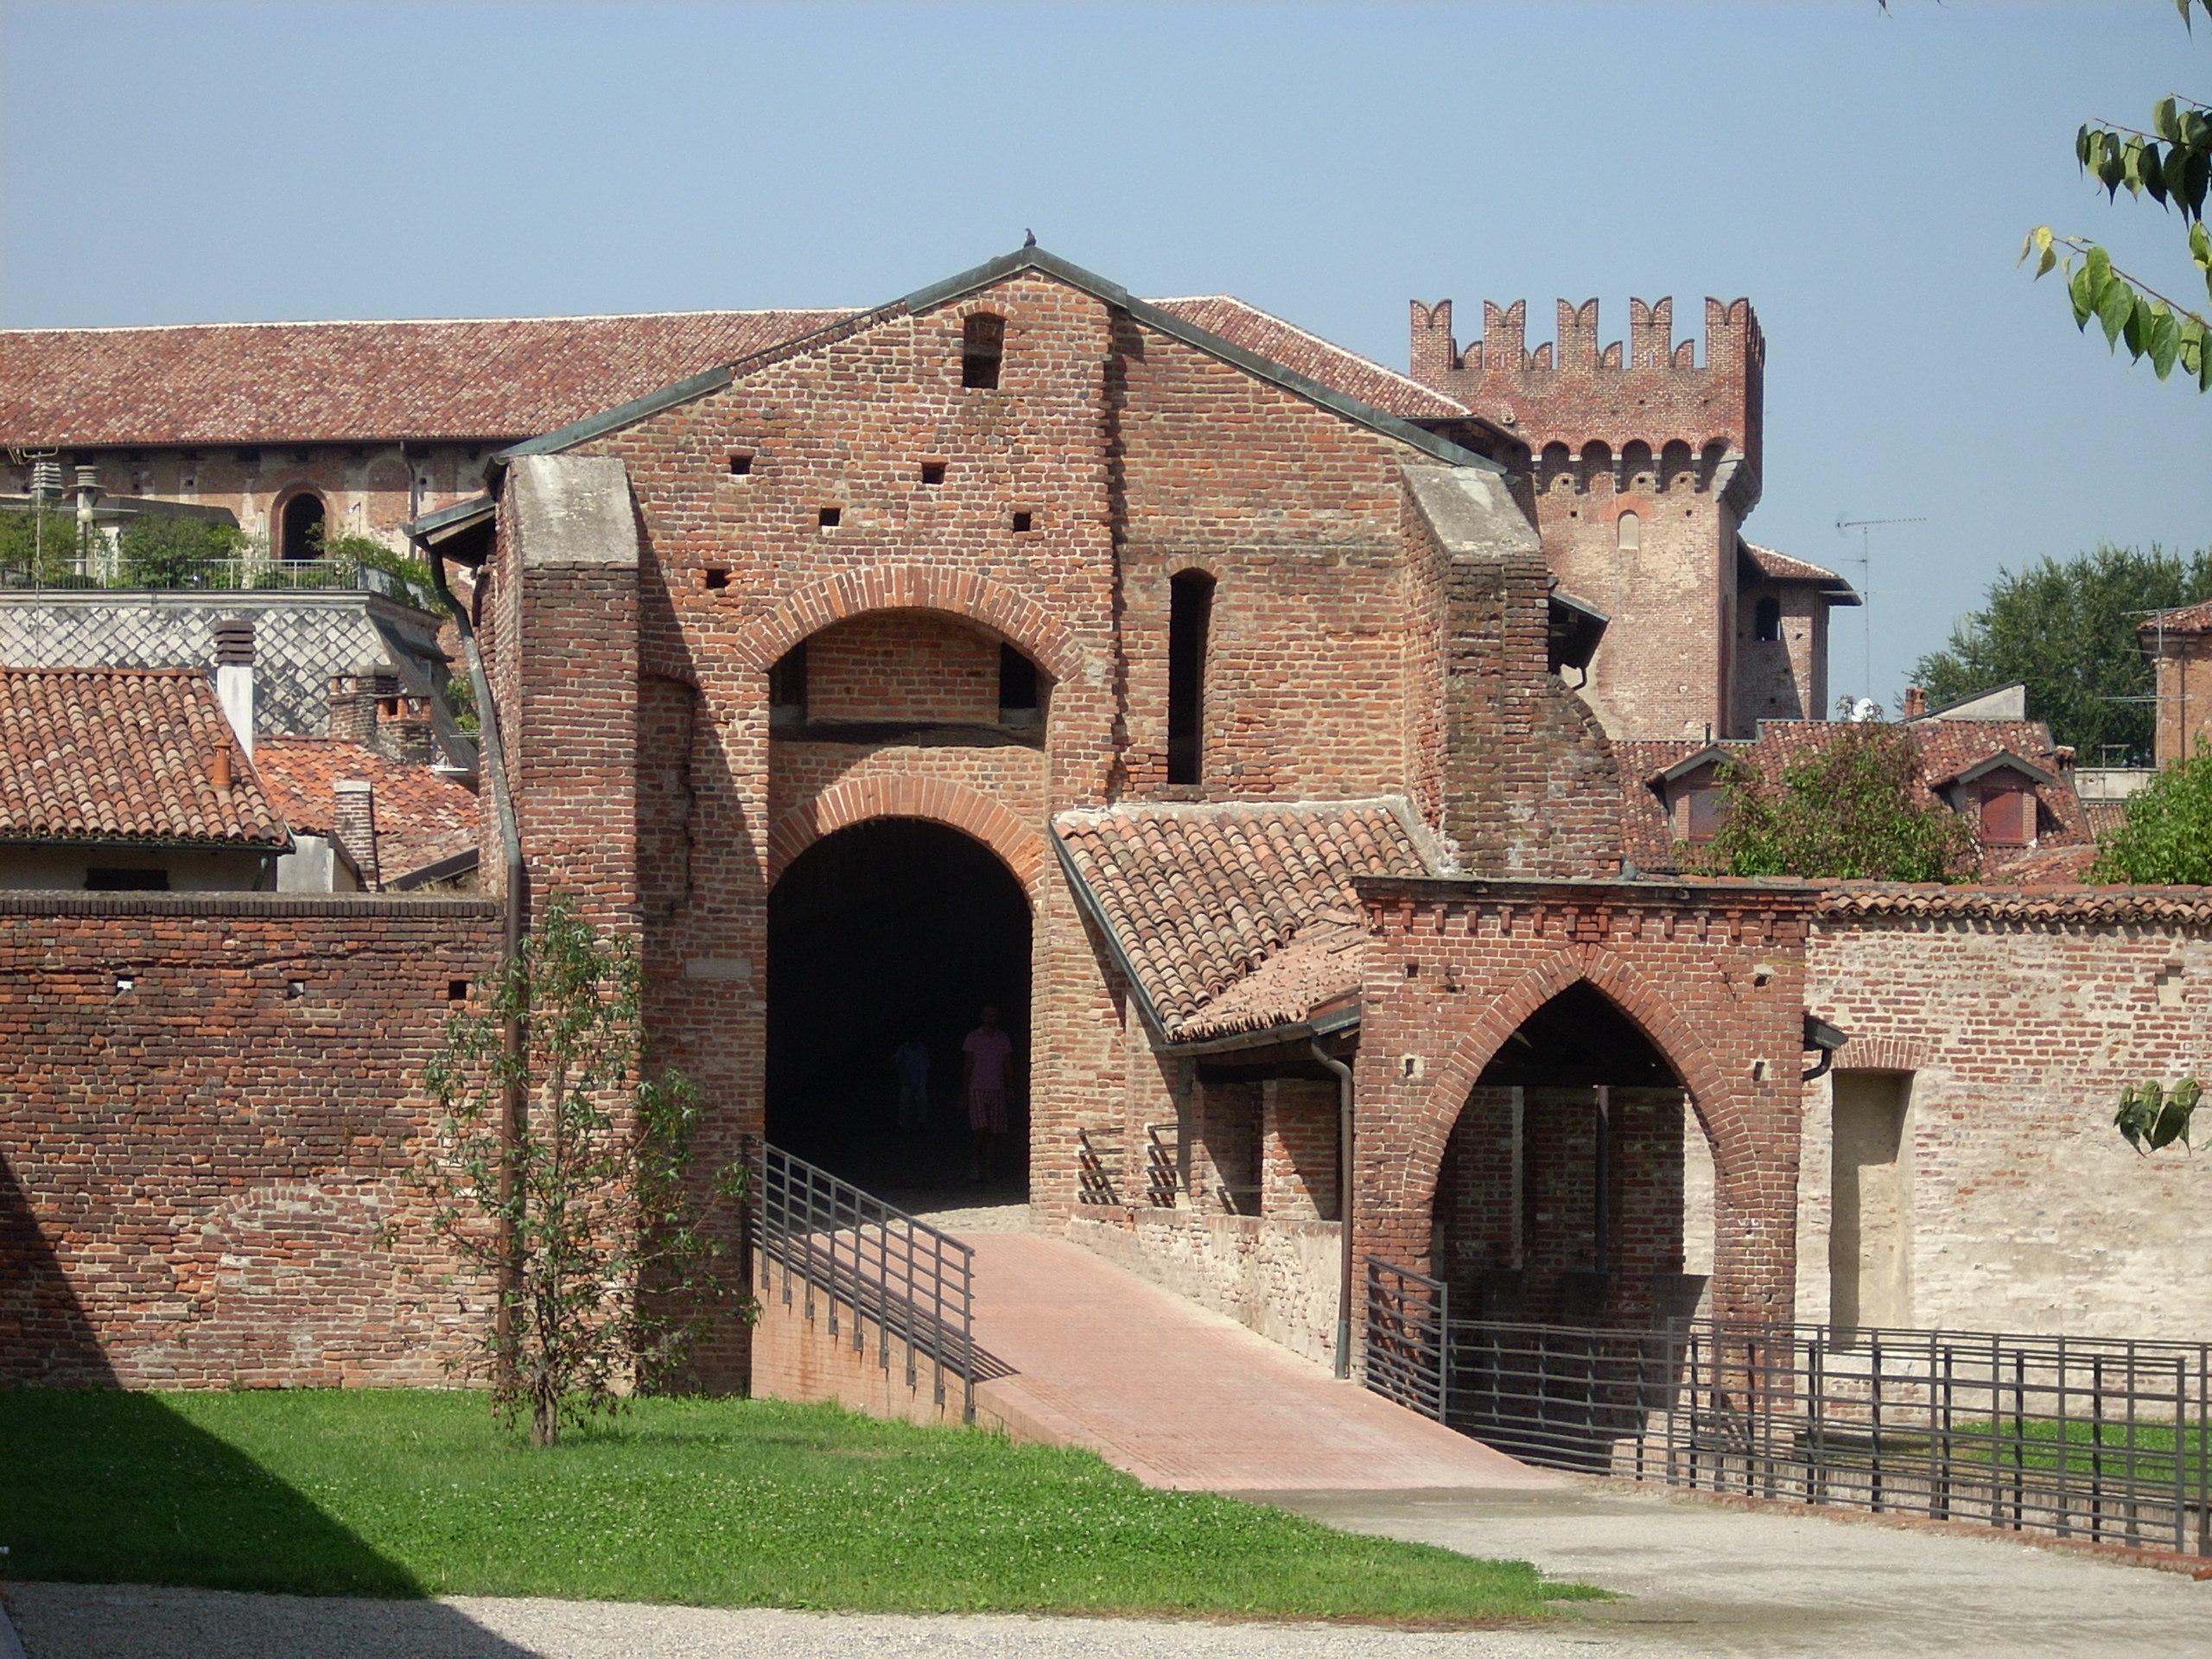 Periferie sub-urbane, San Donato Milanese Metanopoli chapter I analisi e memorie